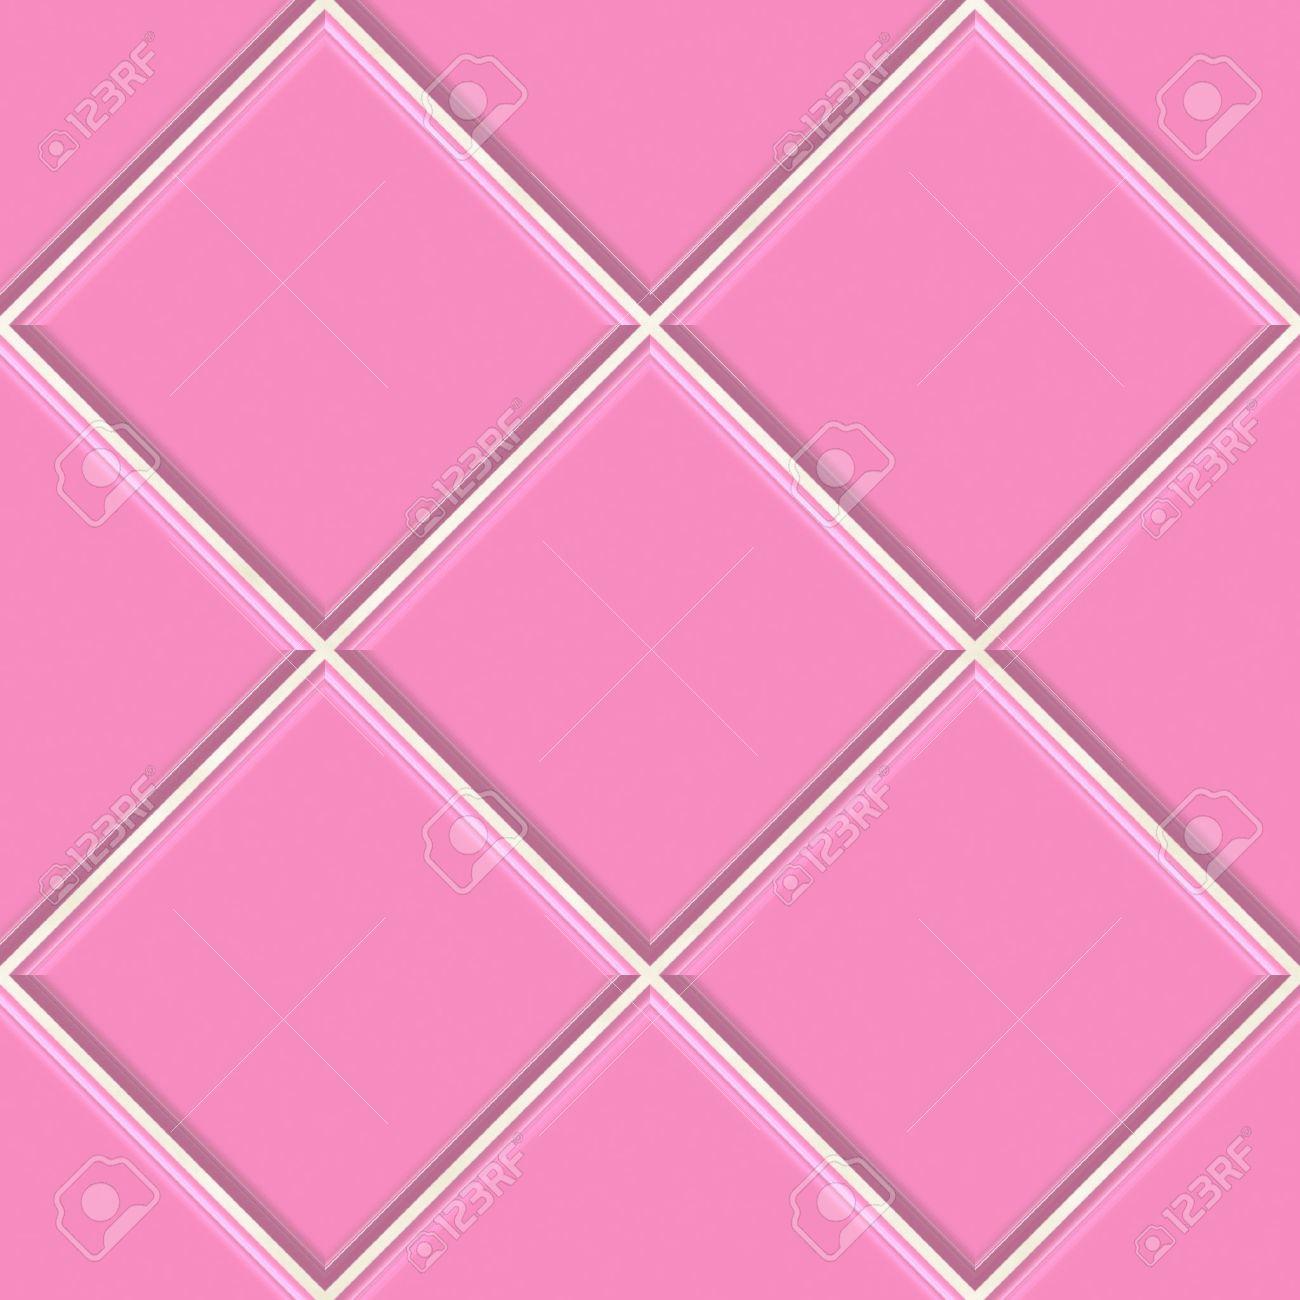 Azulejos Rosas Interesting Latest Mejor Decorar Banos Rosas Ademas - Azulejos-rosas